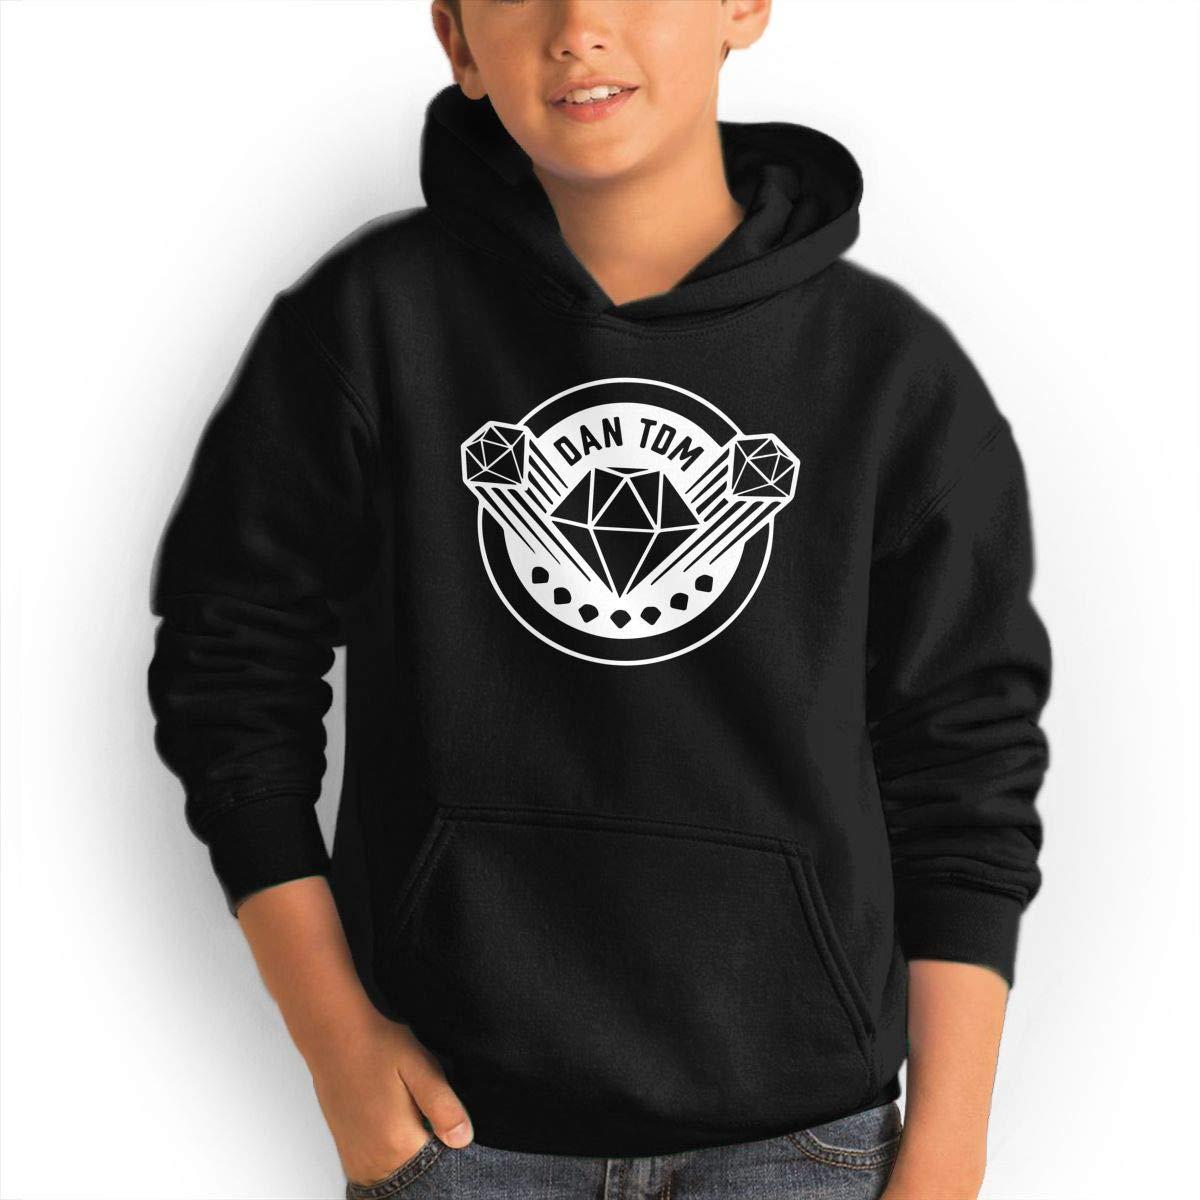 Dantdm Dan Tdm Diamond Teen Pullover Hooded Pocket Sweater For And Girls Shirts